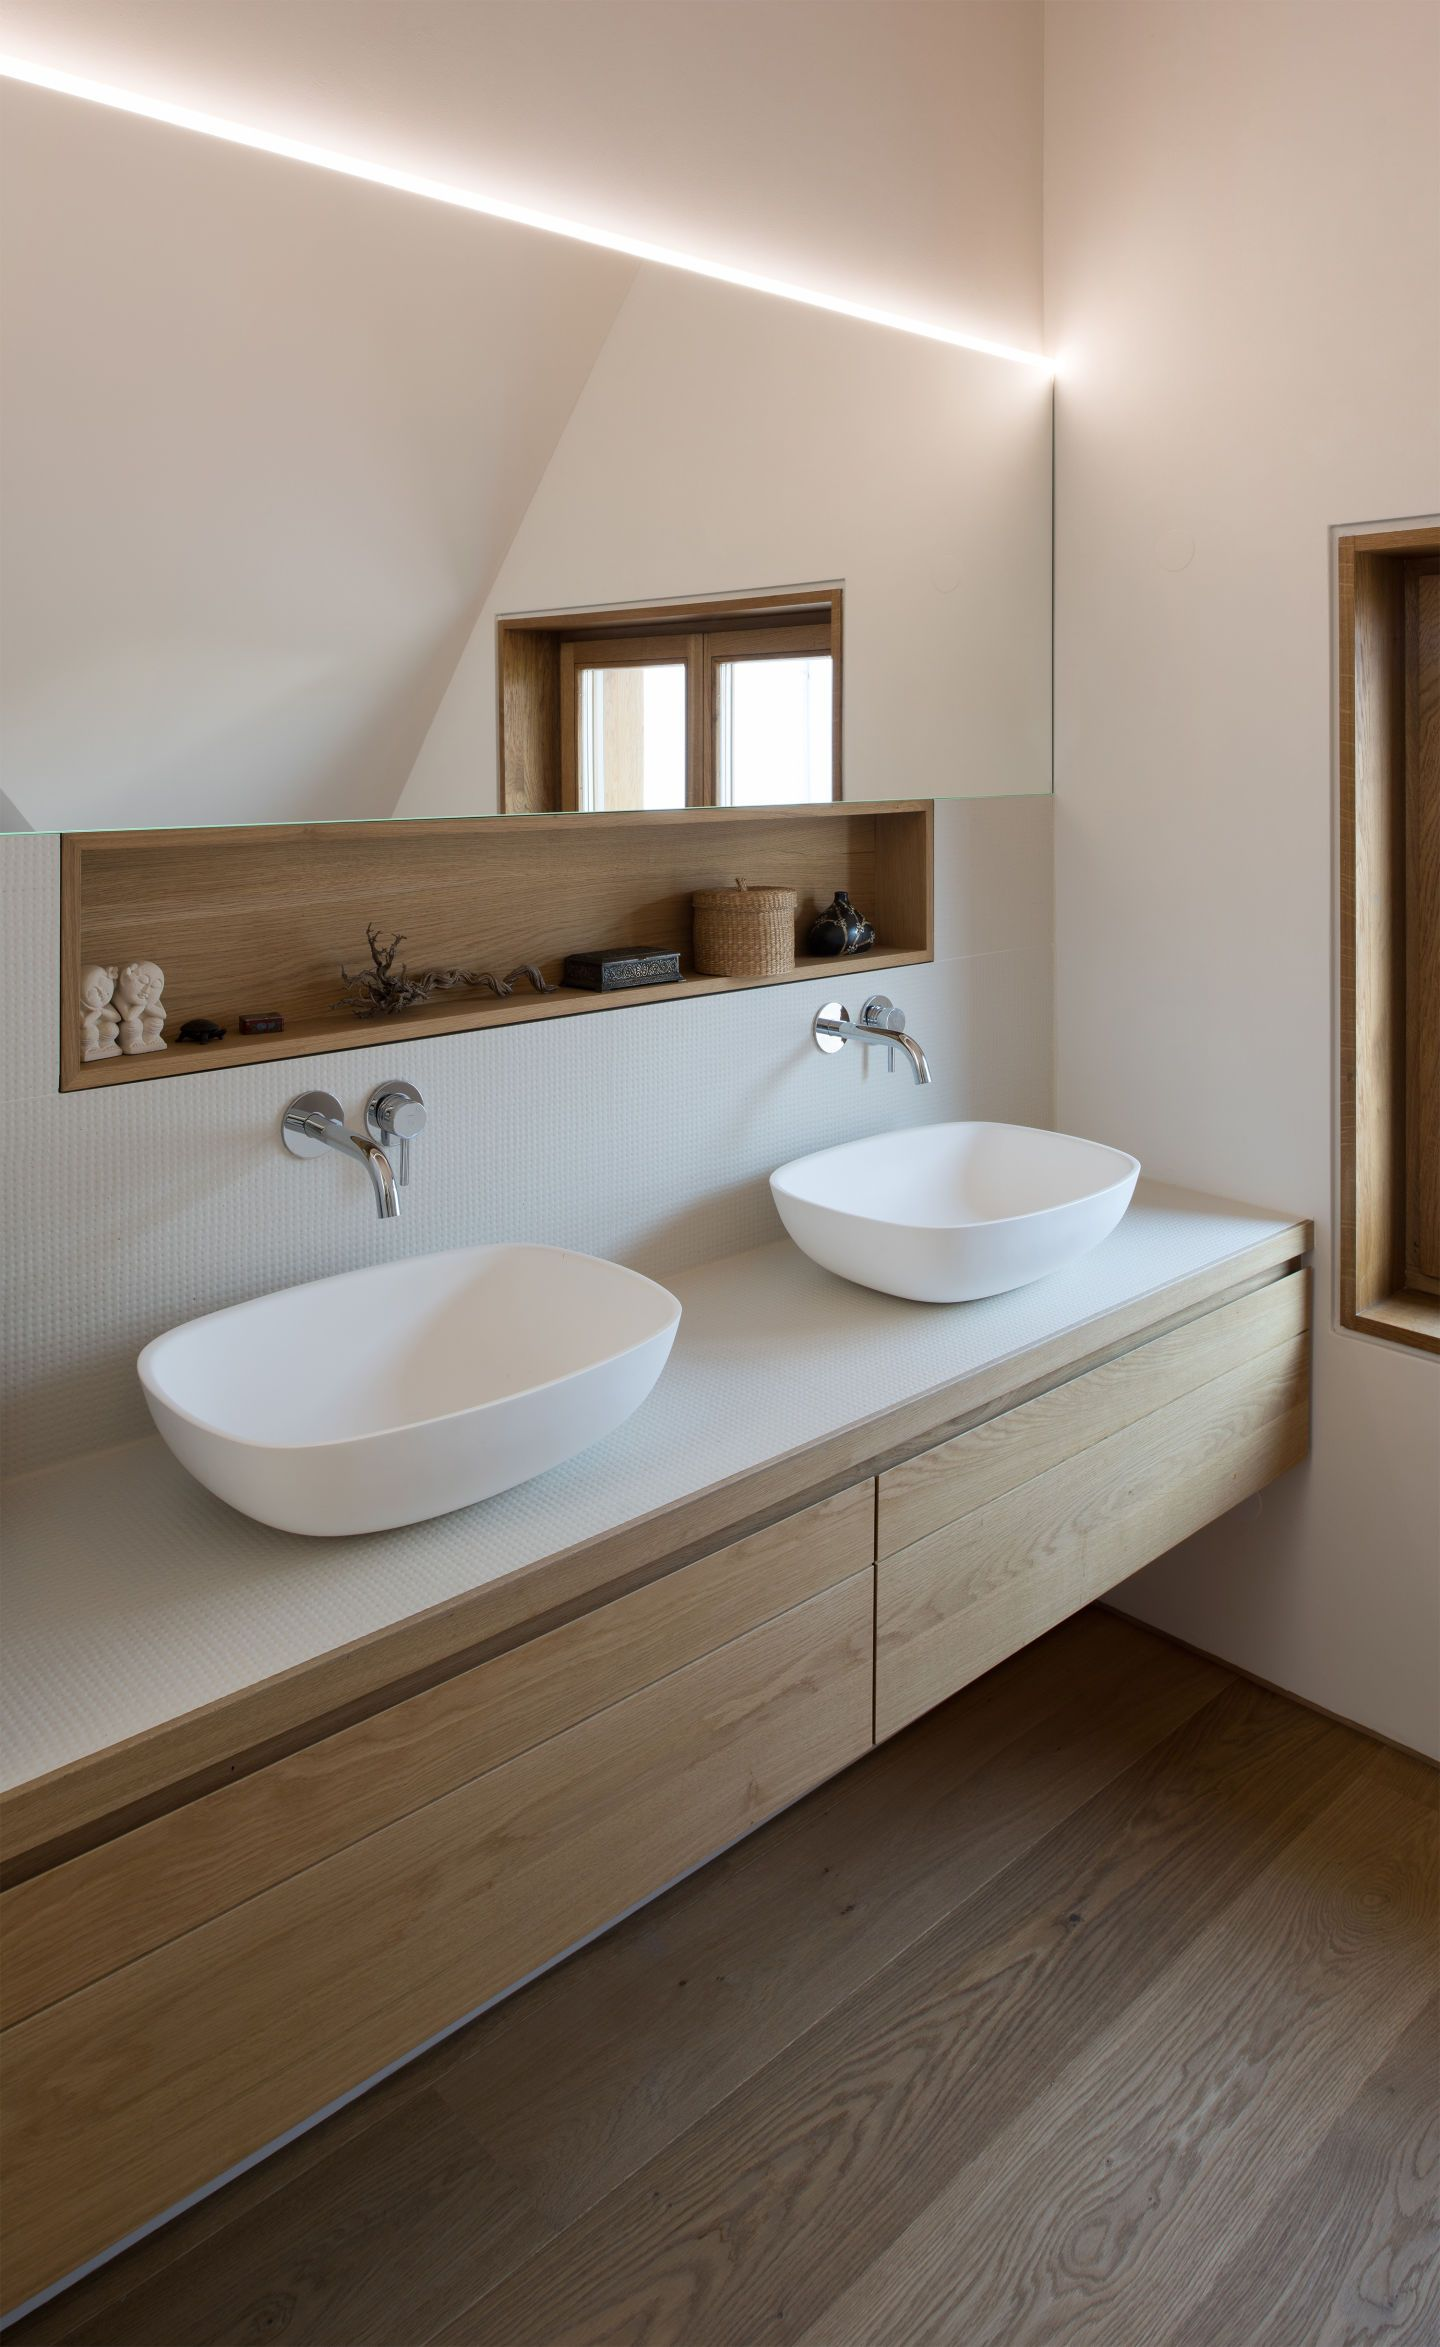 Recessed Shelves Bathroom Http Divisarecom Projects 318044 Nbundm Architekten Haus Spk